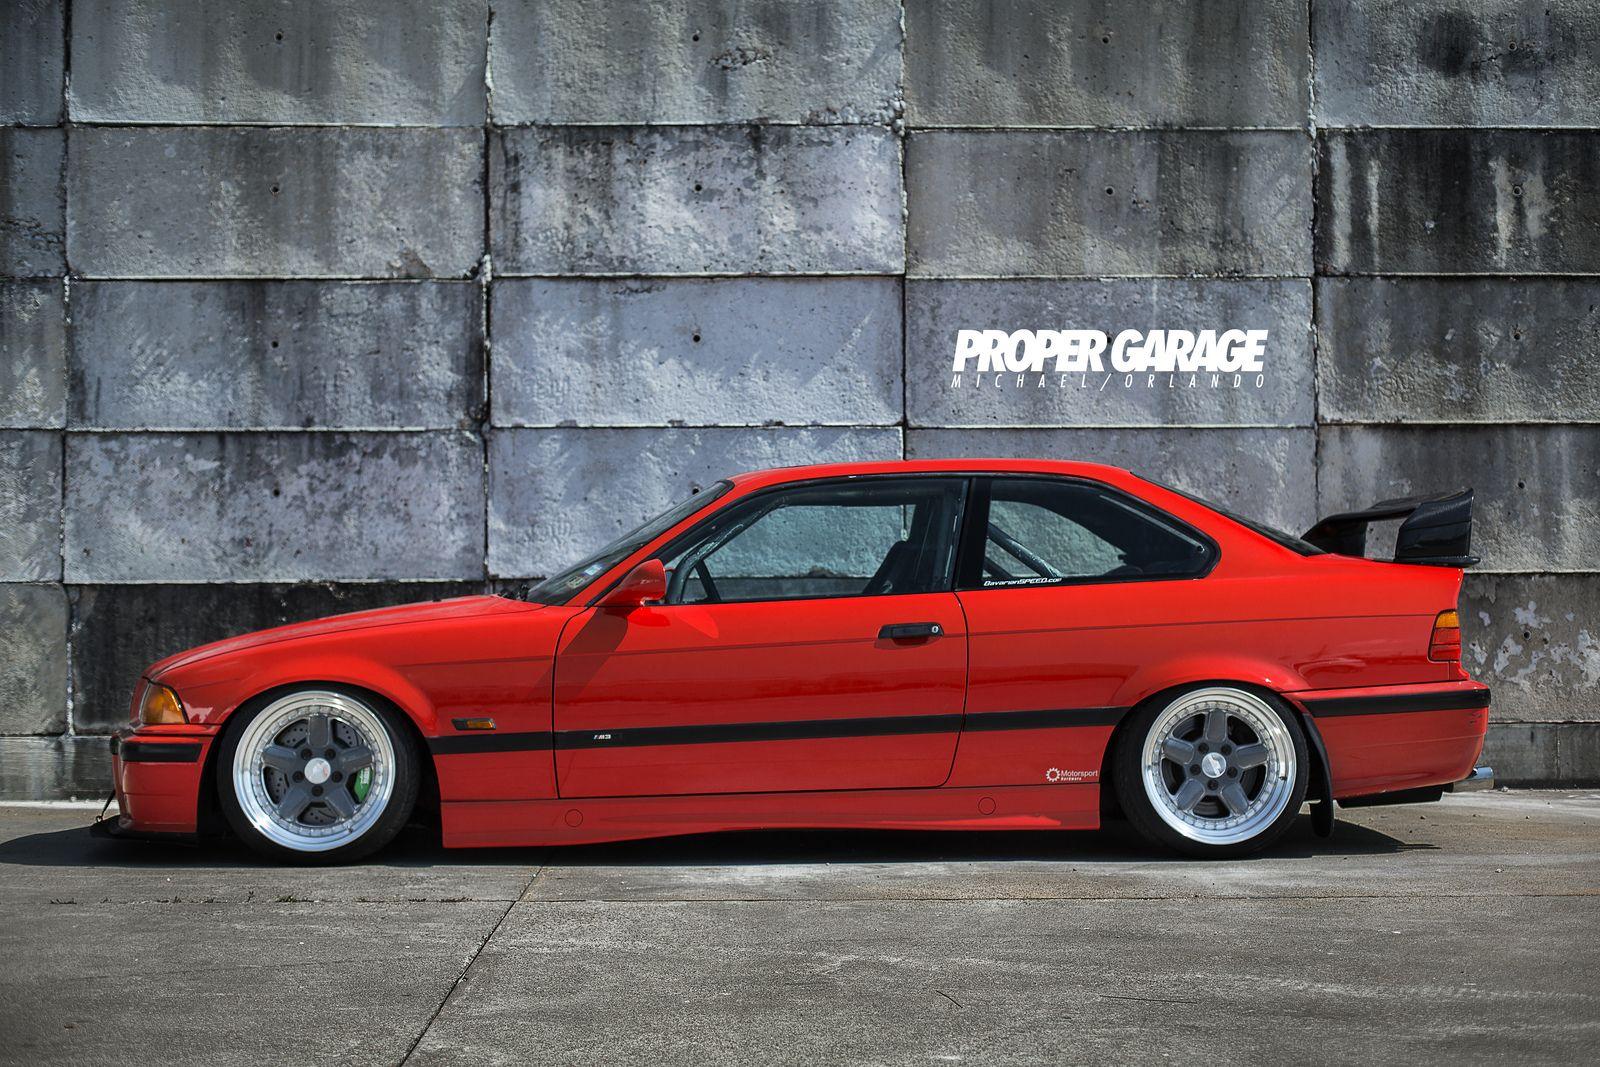 Proper garage bmw m3 38 proyek untuk dicoba for Garage bmw 33